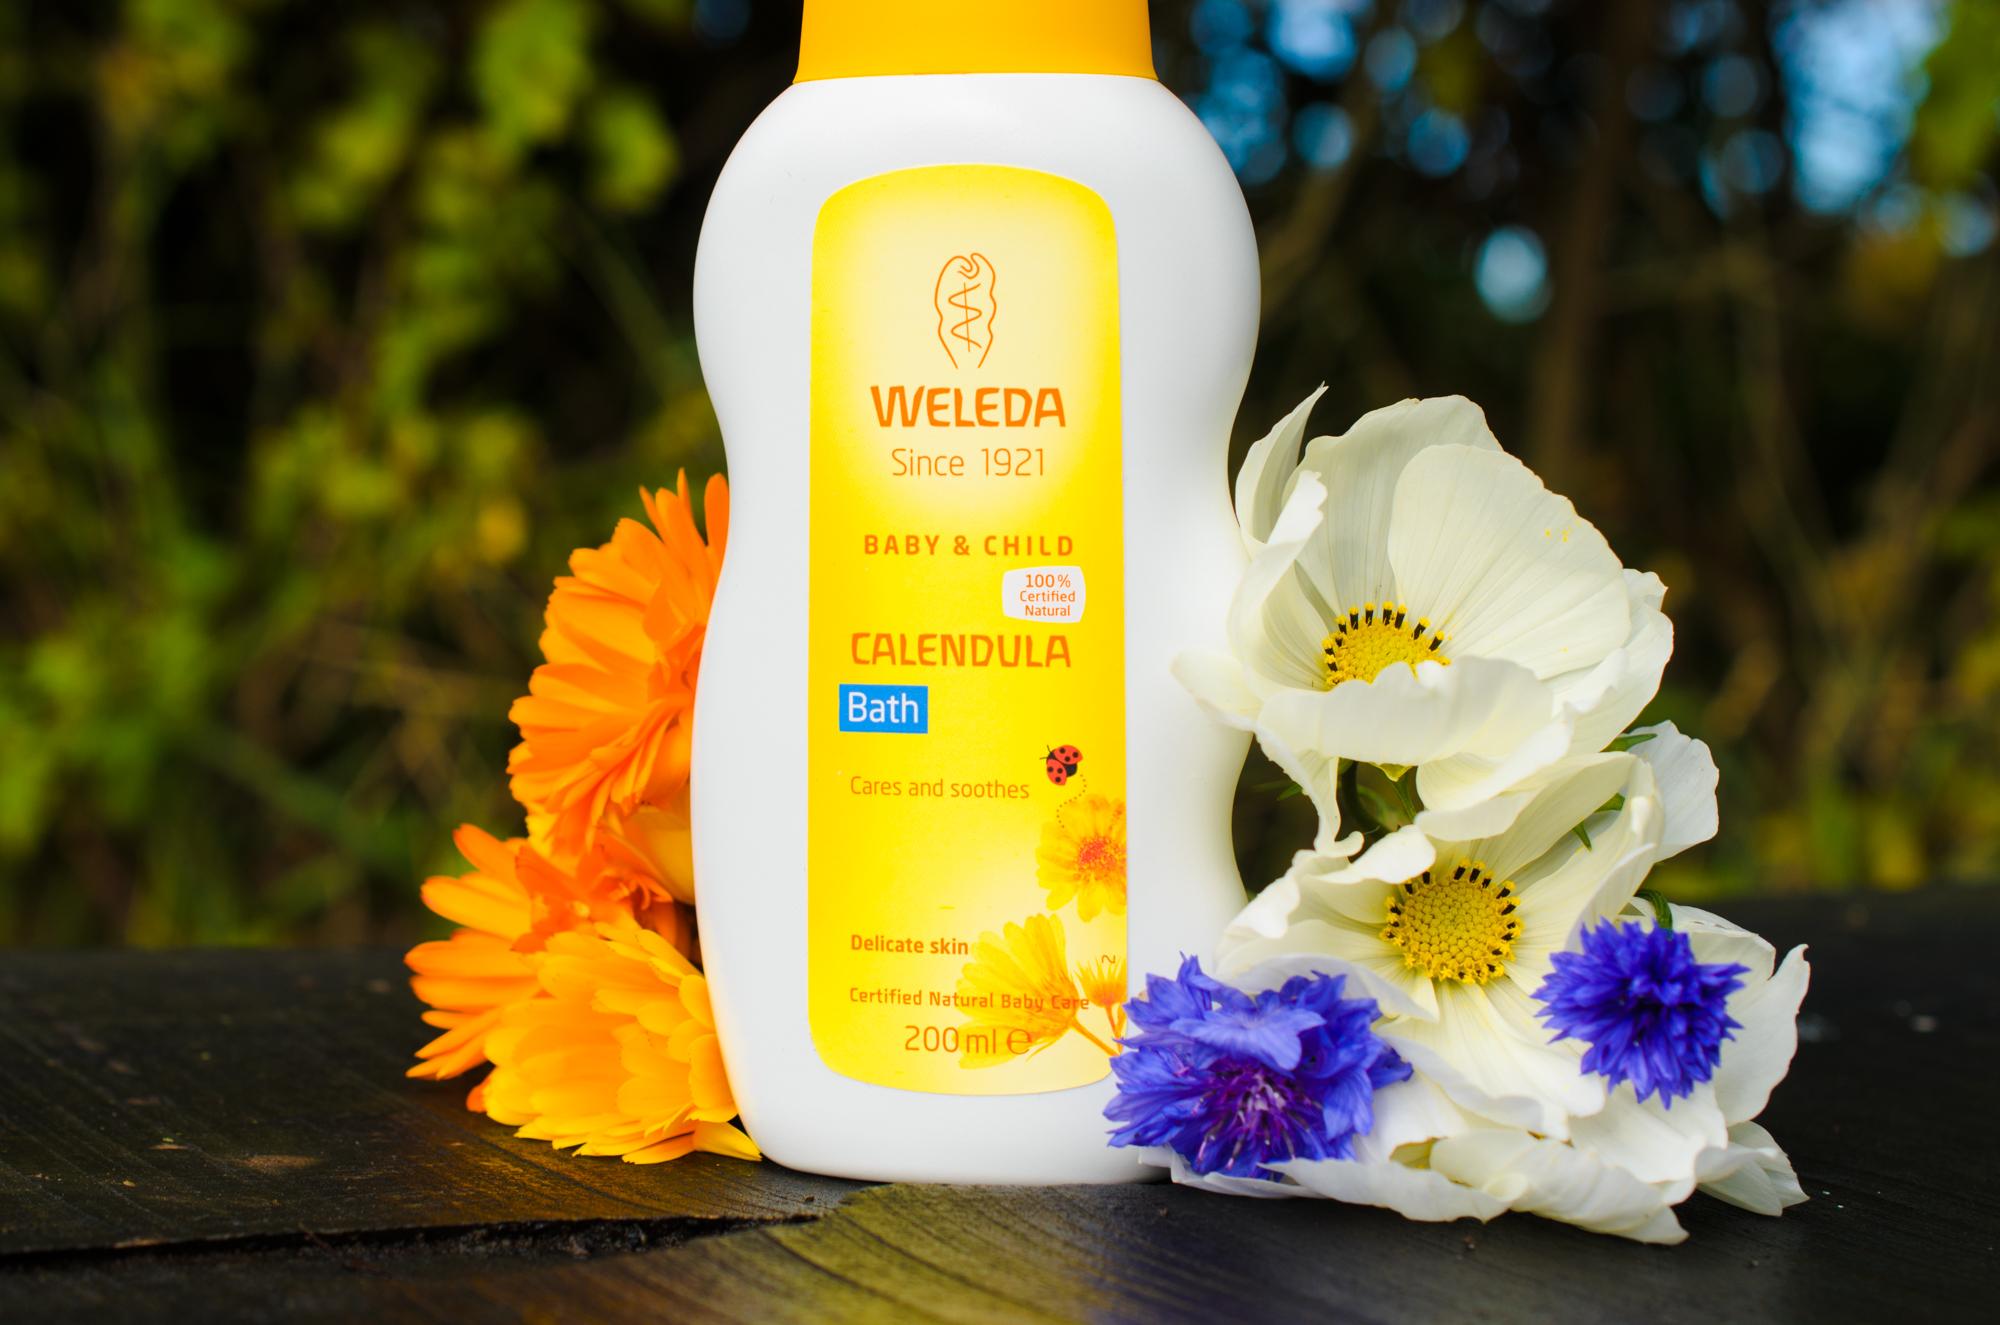 Weleda Baby Calendula Bath review - Natural Beauty with Baby